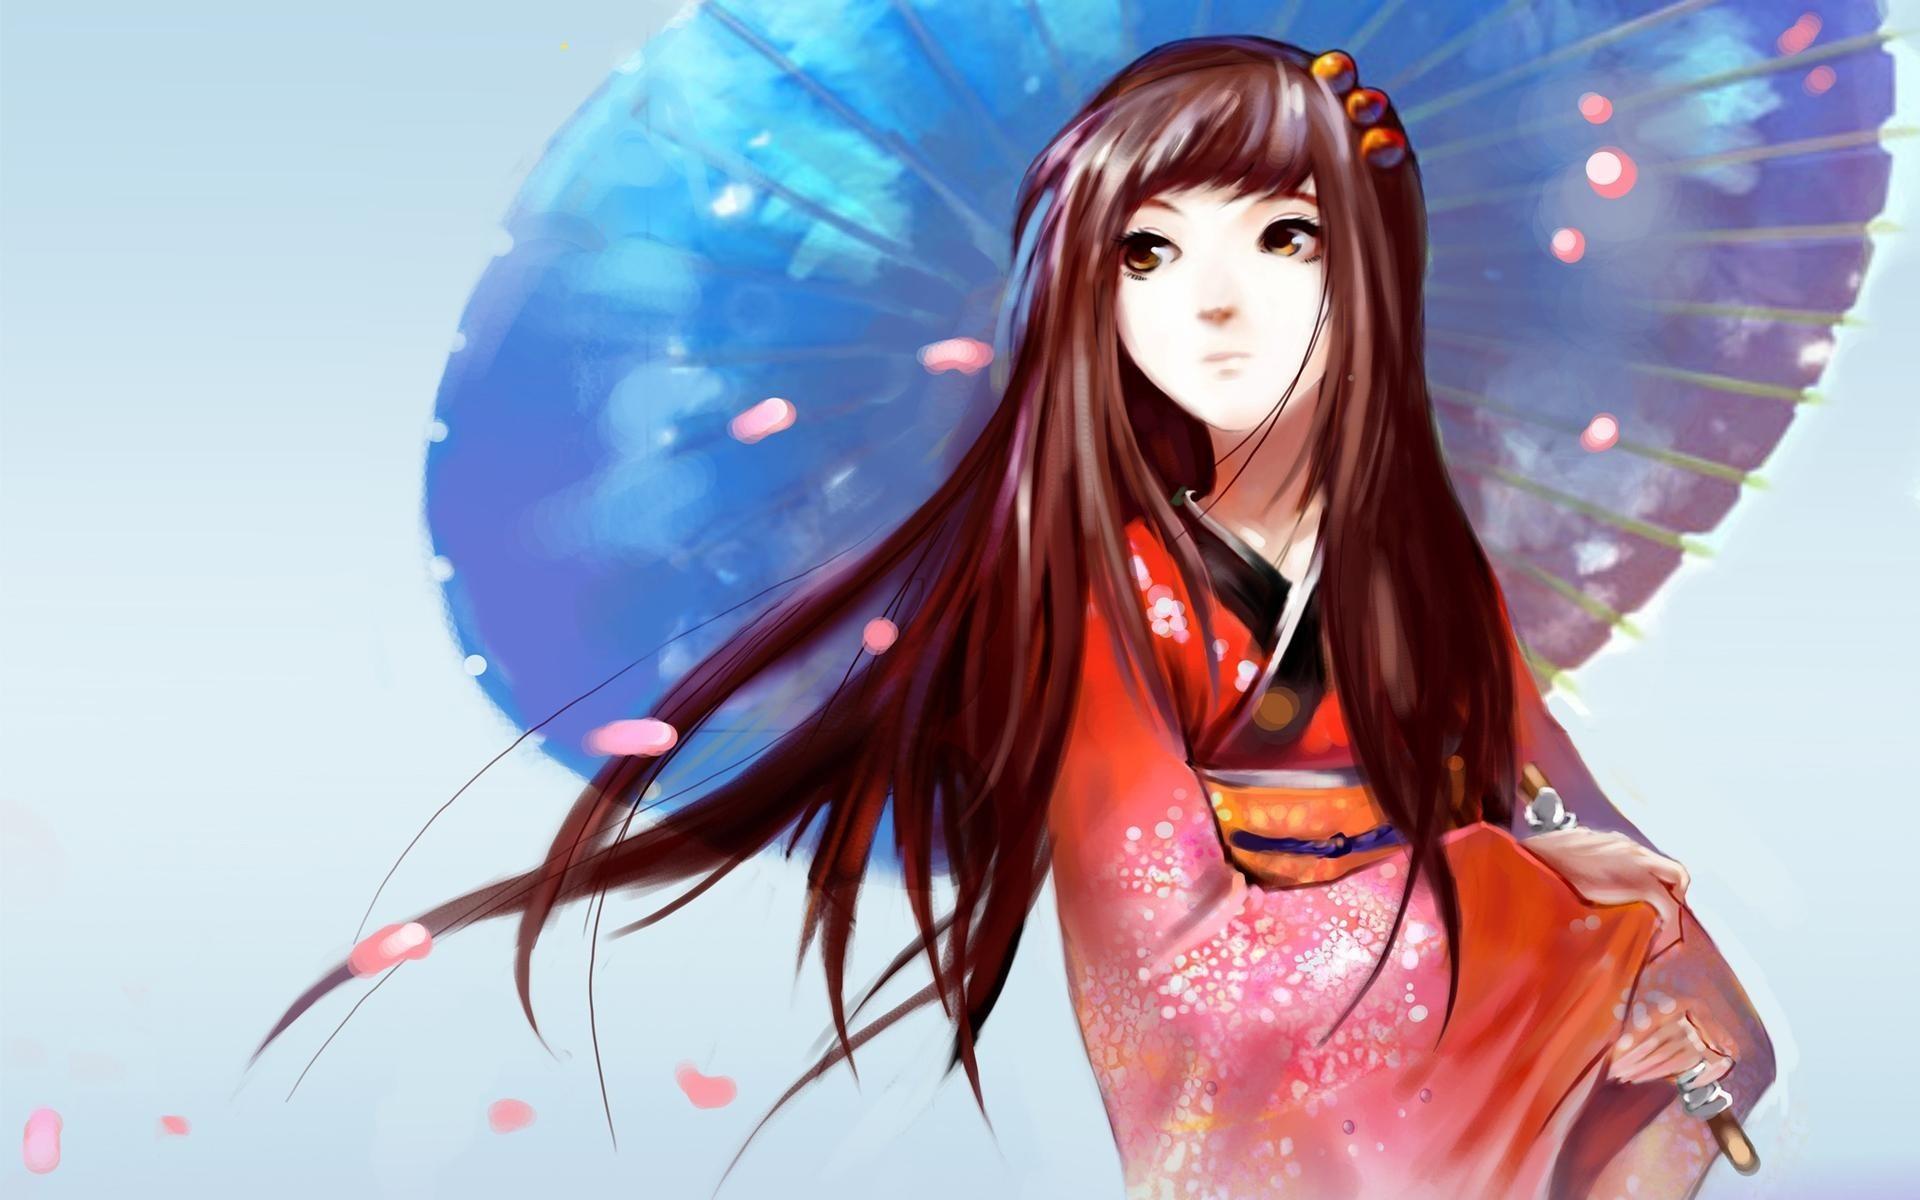 Anime Girl Japan Wallpapers - Wallpaper Cave